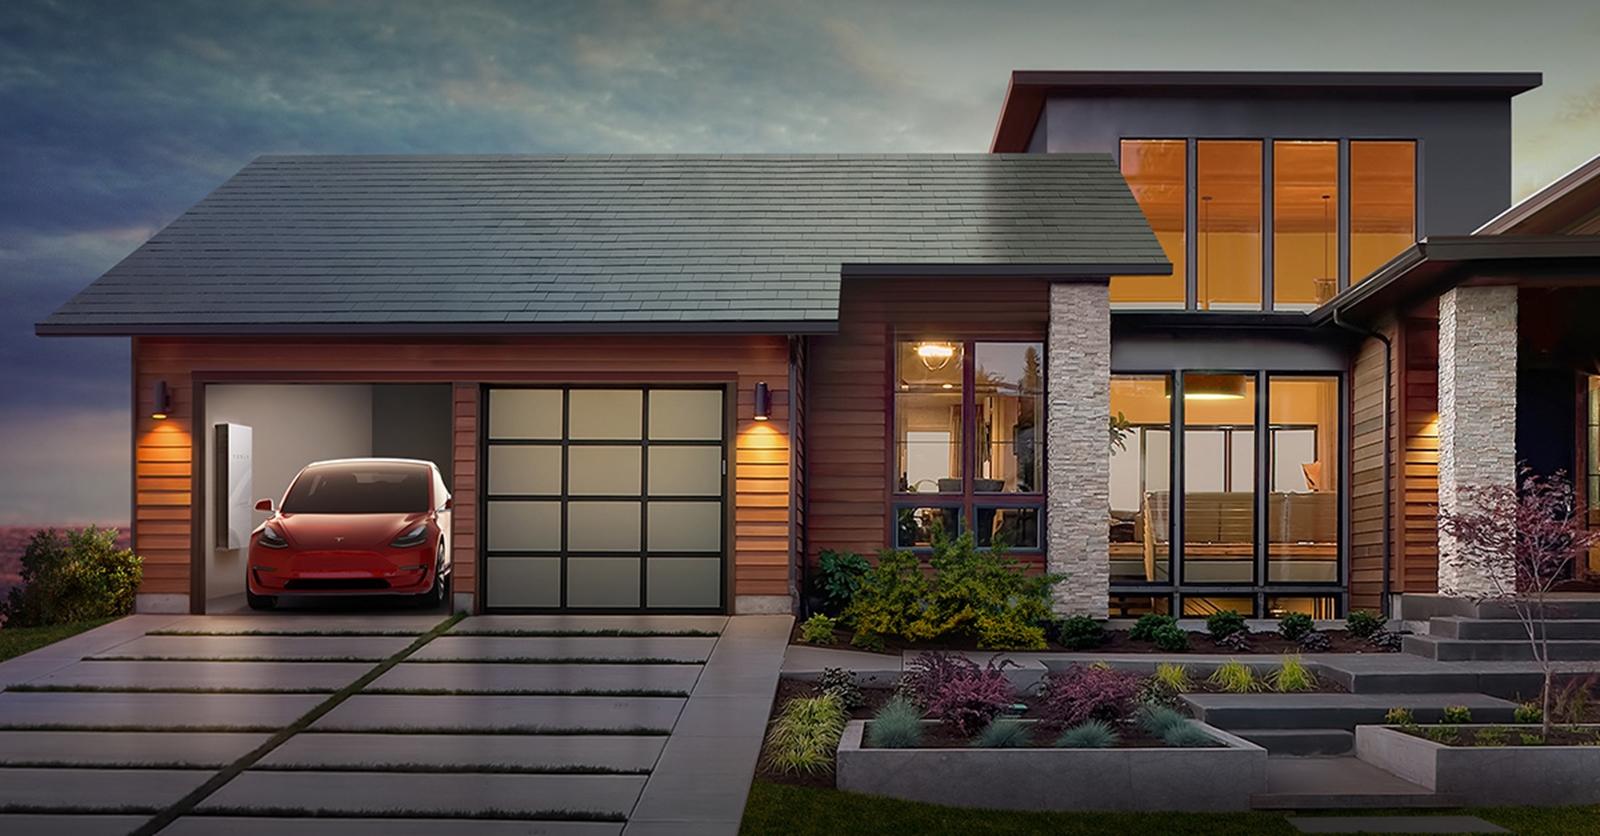 Tesla Techo Solar Casas (1)